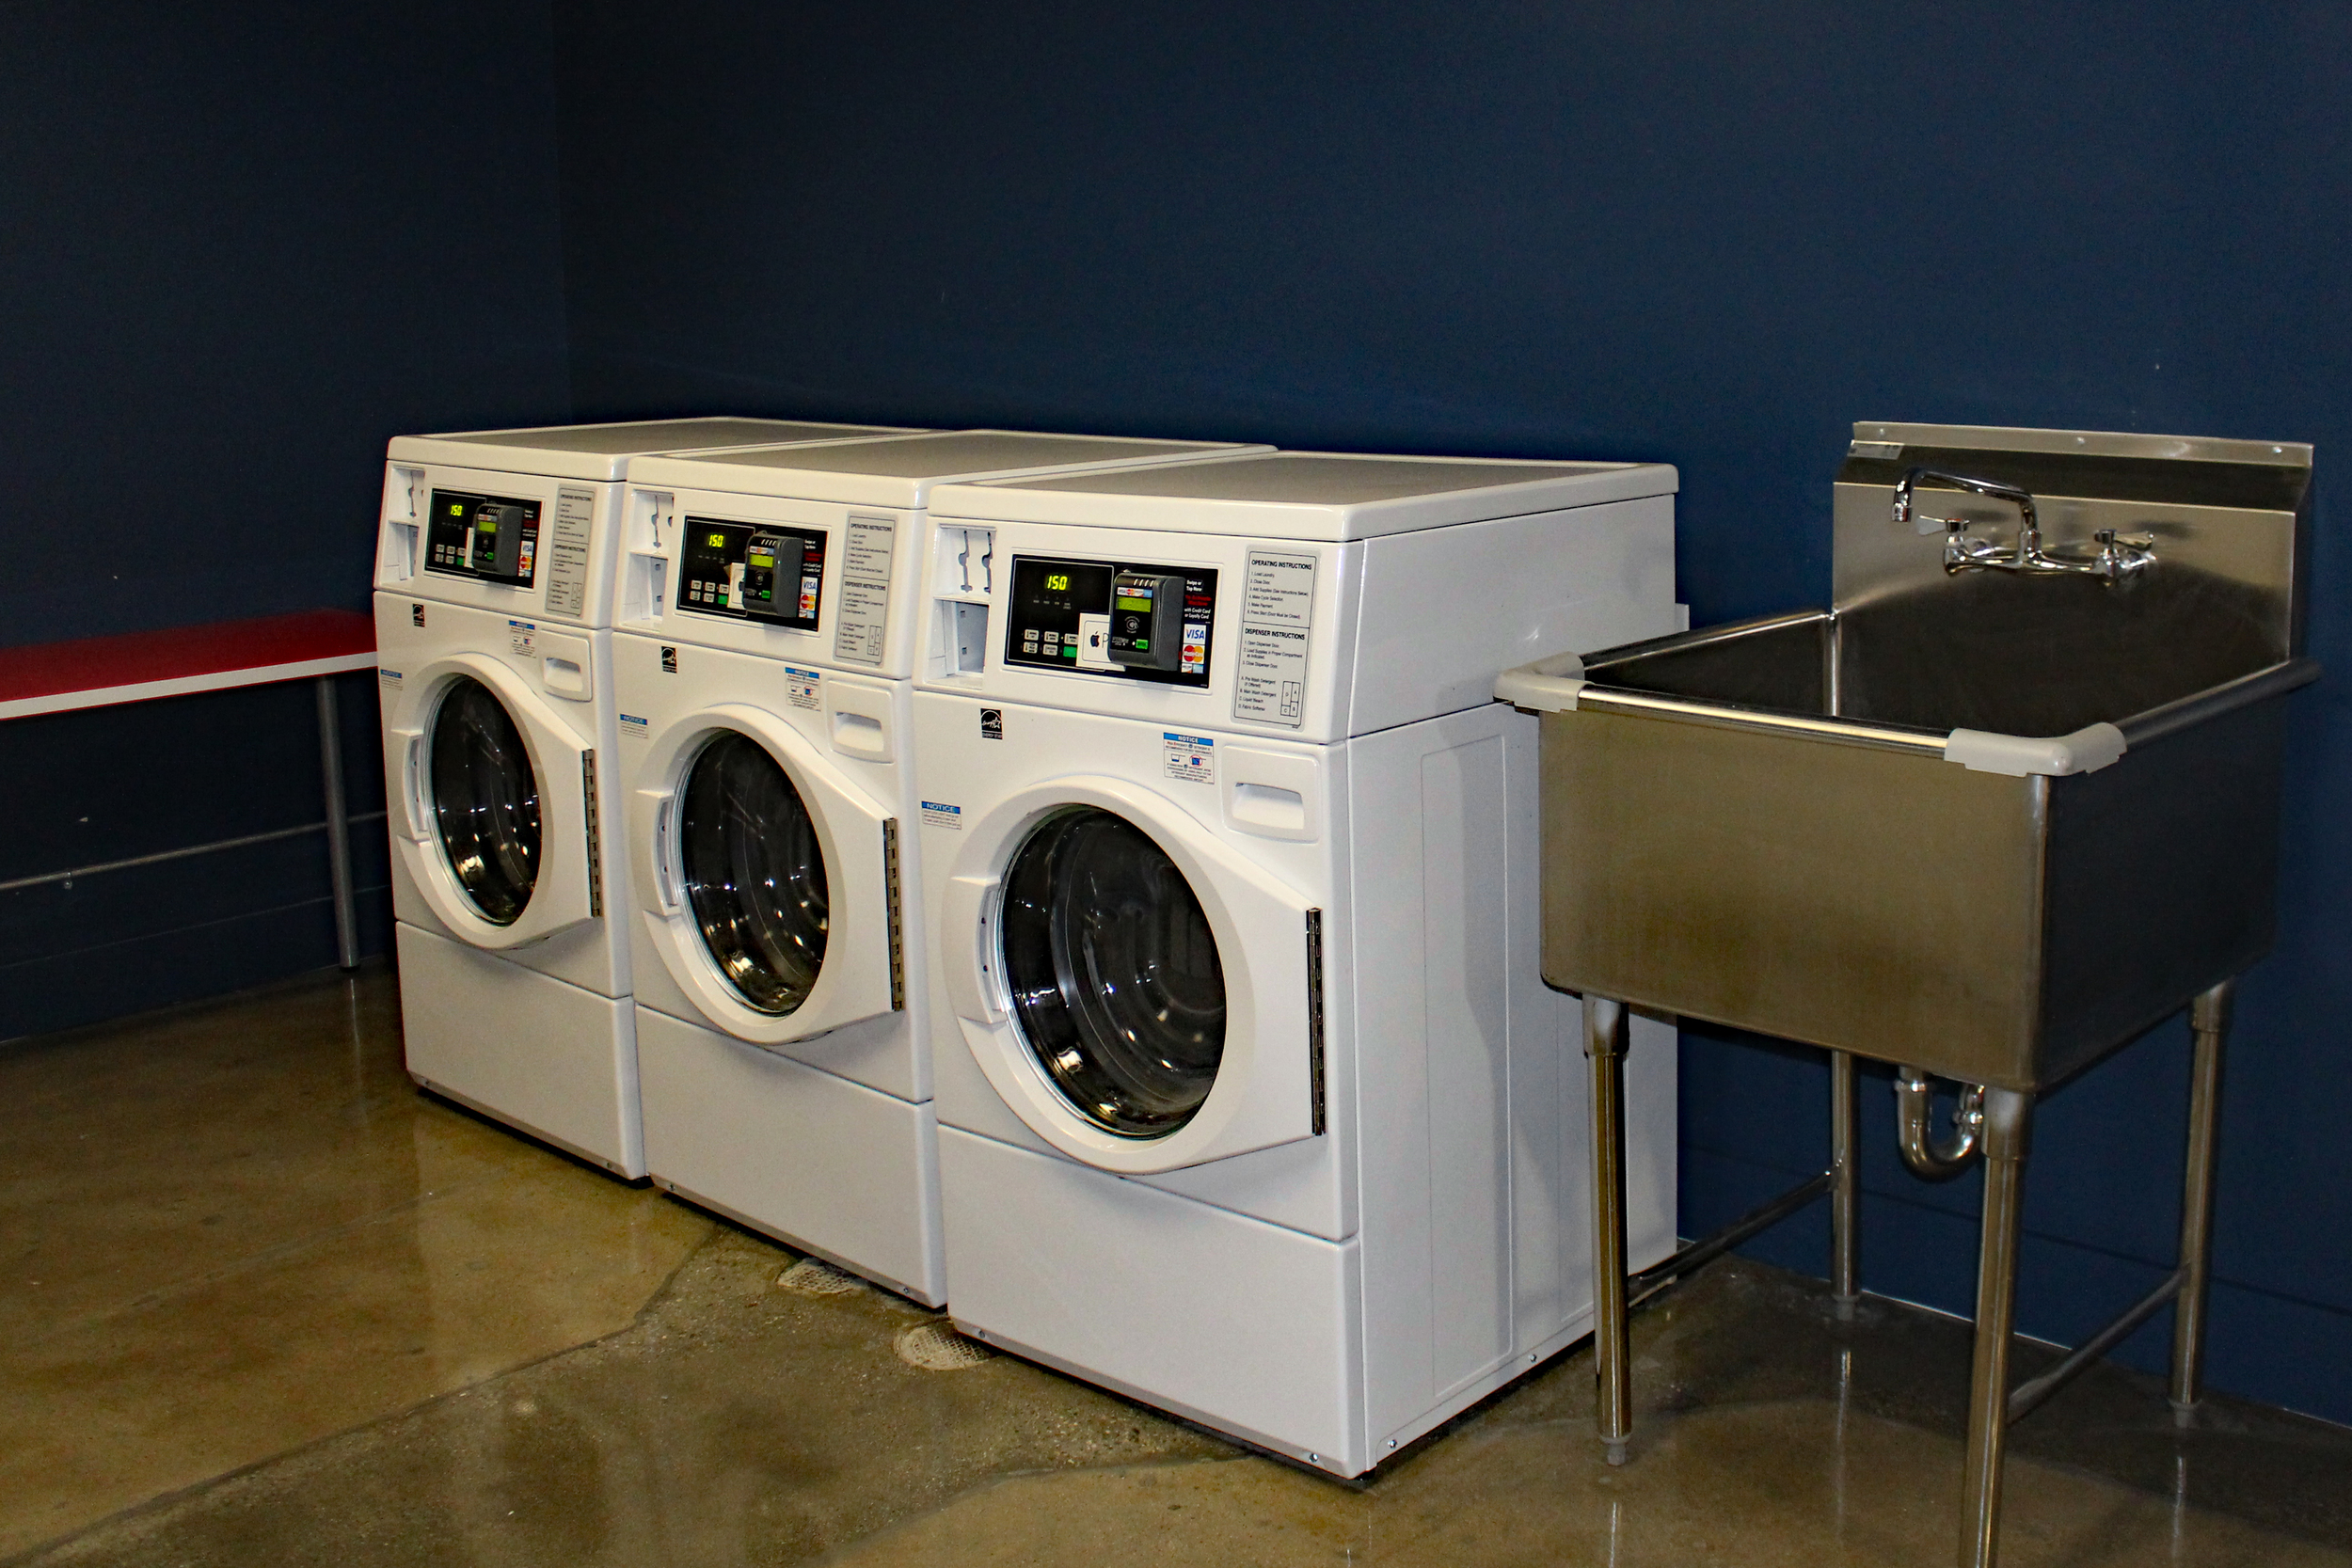 Garment Lofts Laundry Facilities